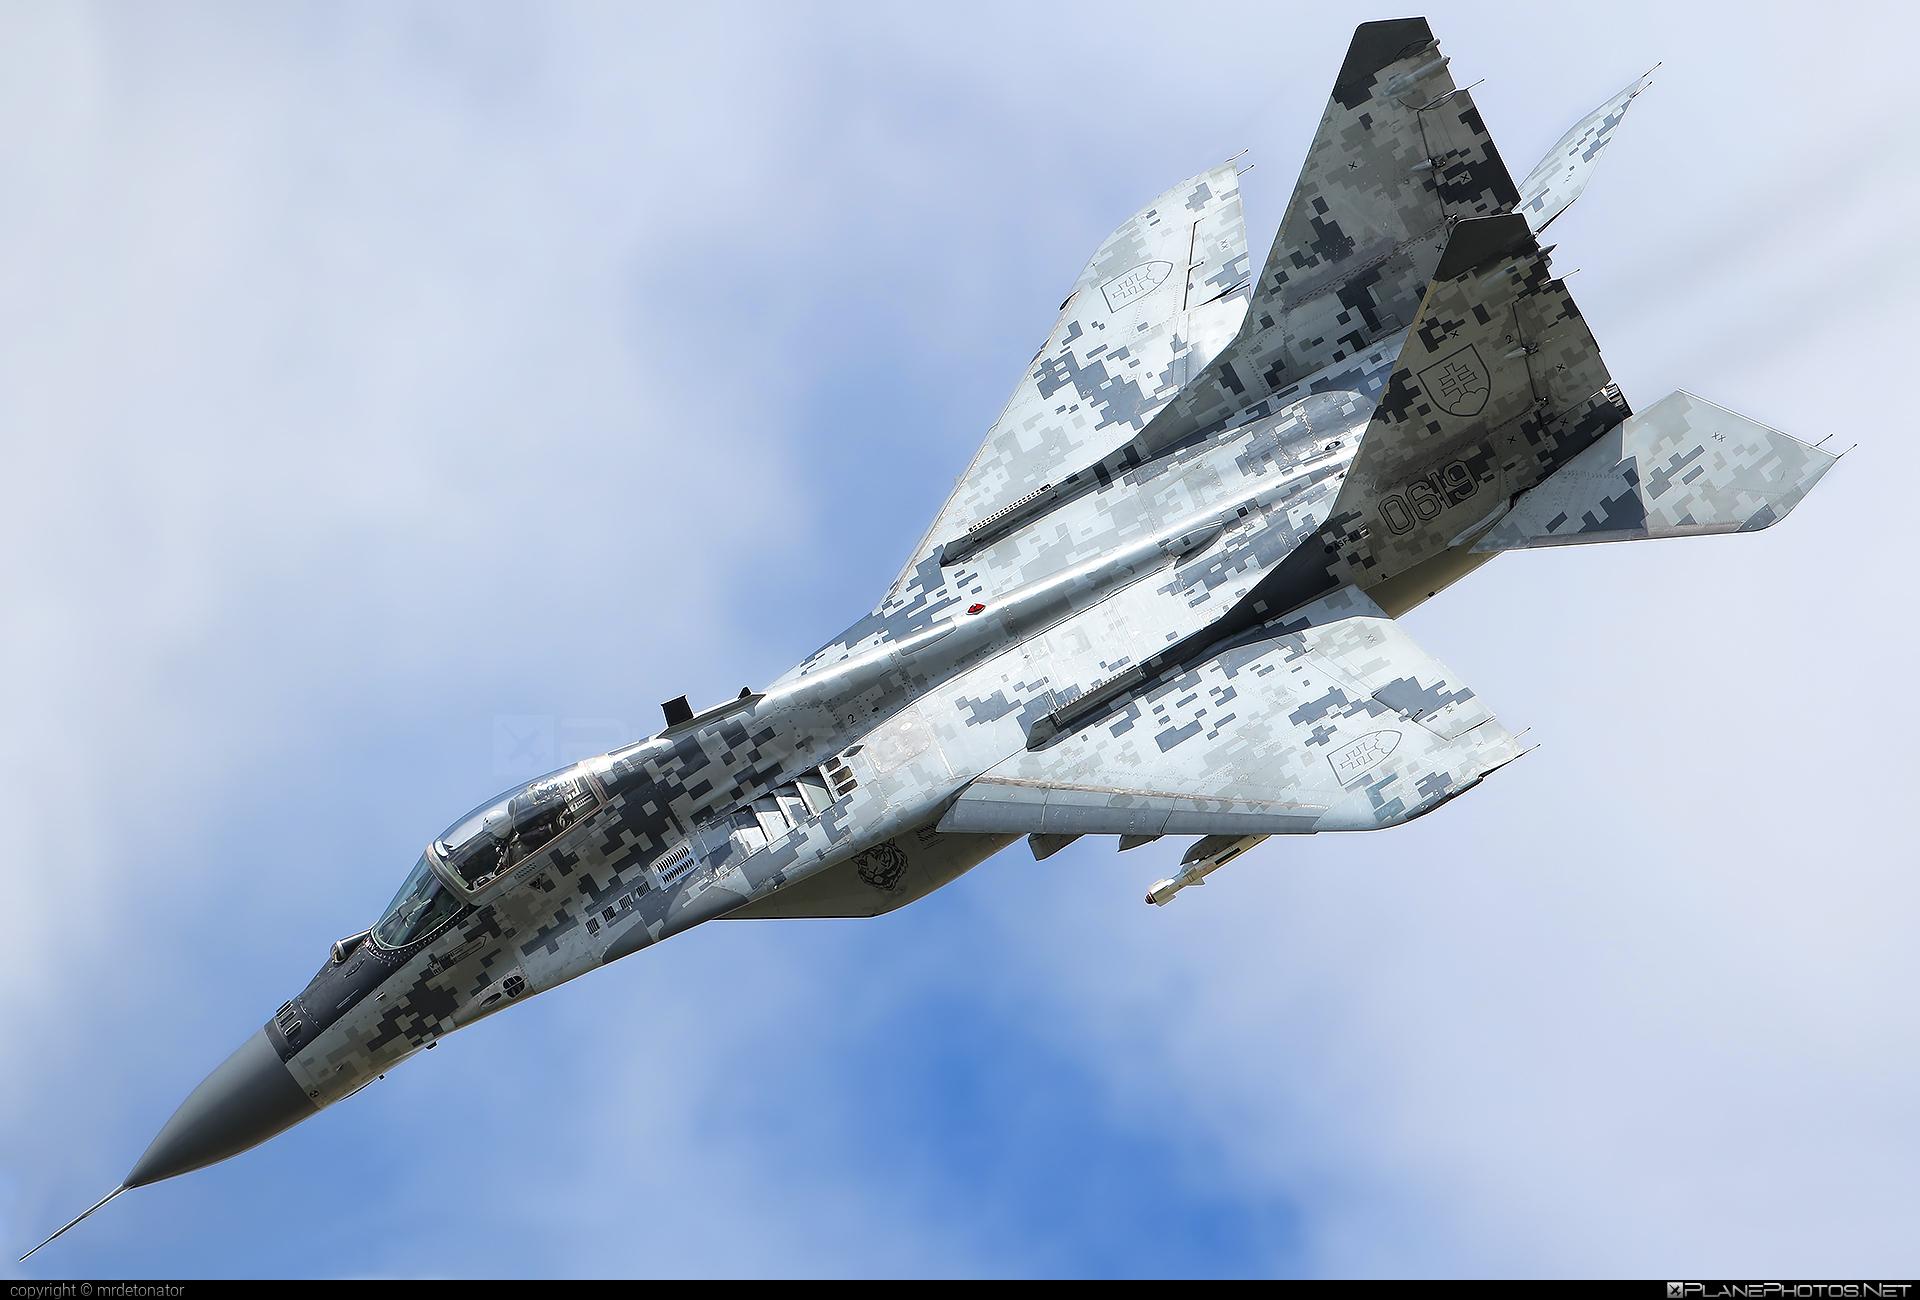 Vzdušné sily OS SR (Slovak Air Force) Mikoyan-Gurevich MiG-29AS - 0619 #mig #mig29 #mig29as #mikoyangurevich #slovakairforce #vzdusnesilyossr